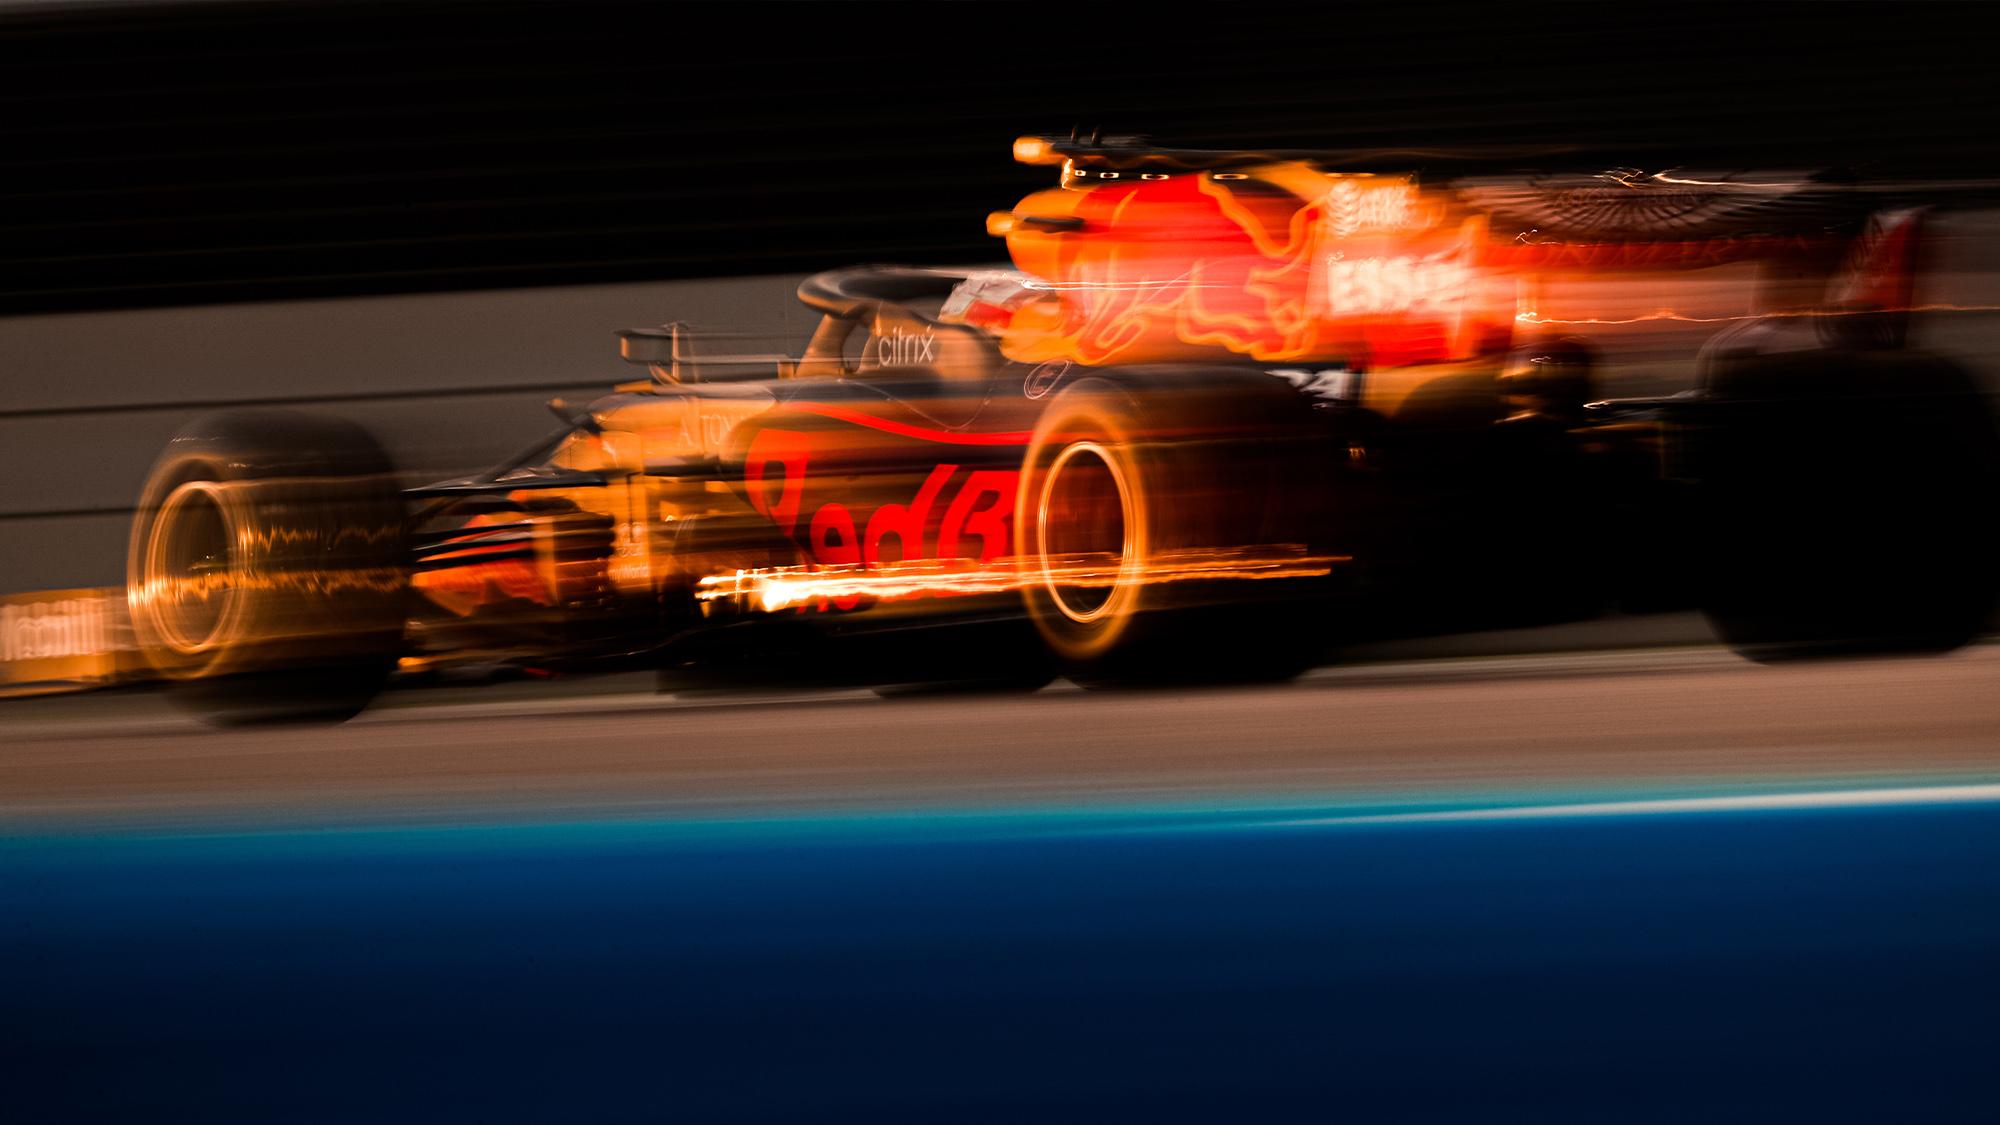 2020 Red Bull blurred